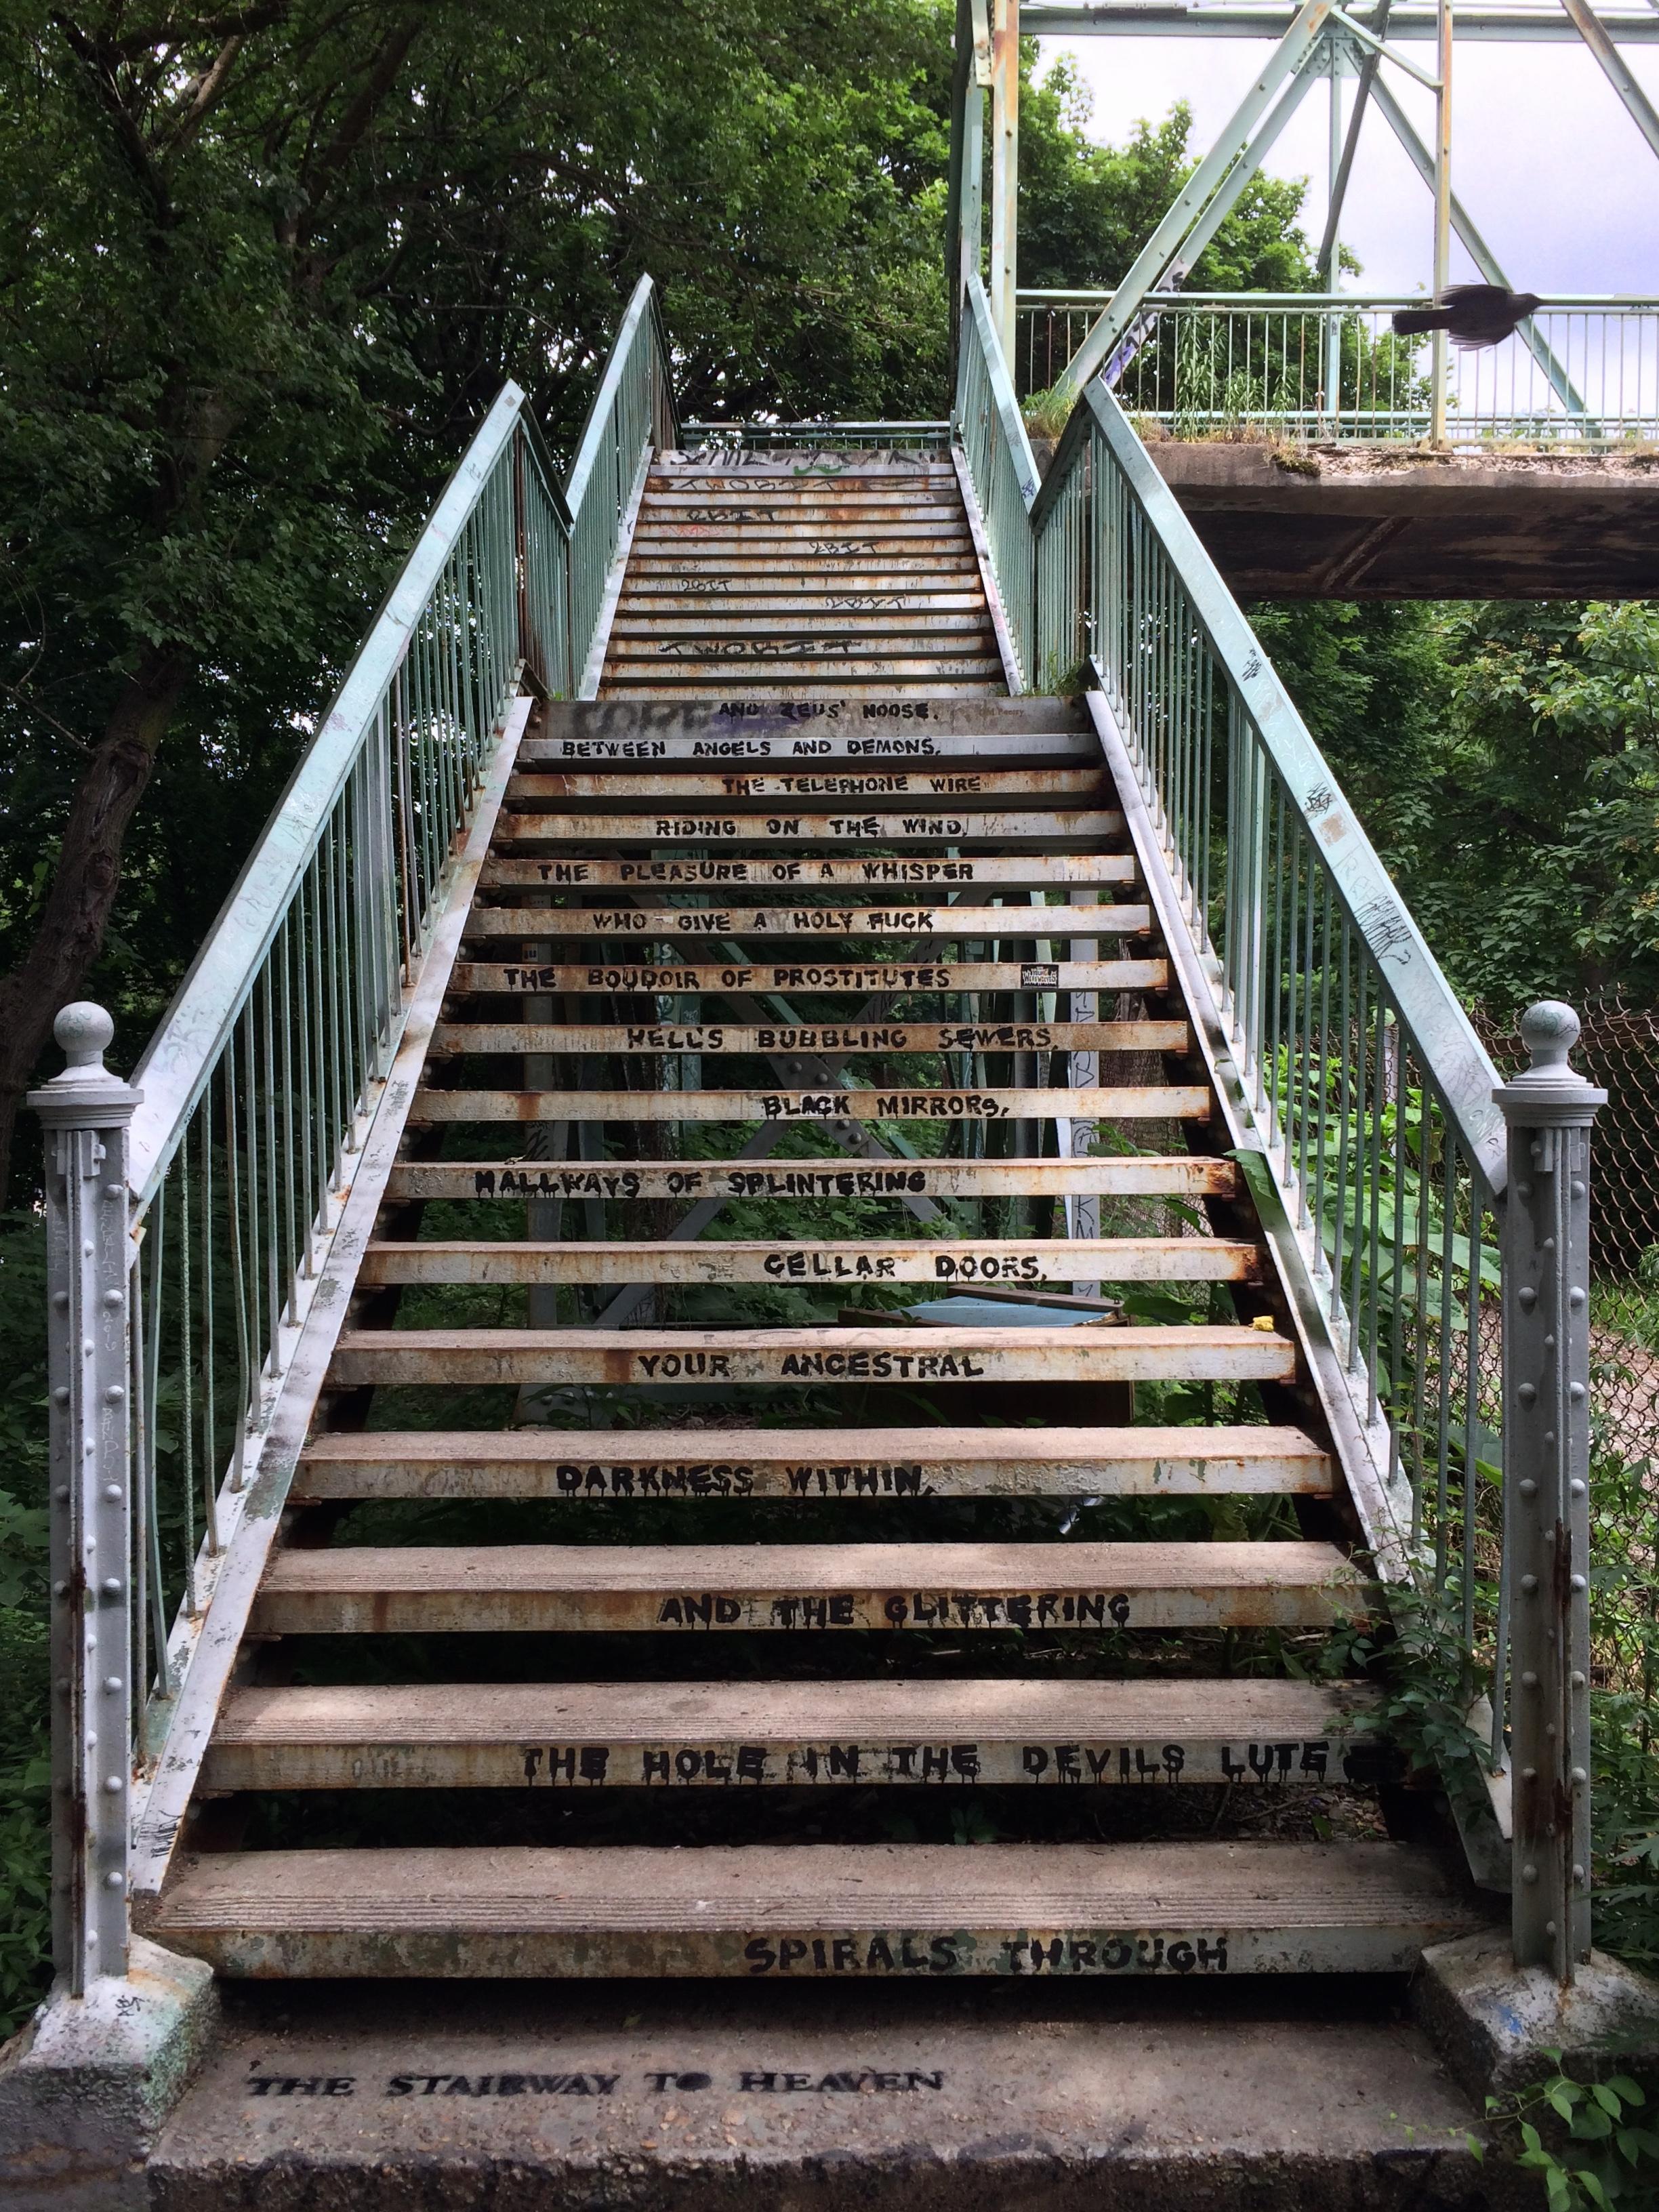 the_stairway_to_heaven.jpg